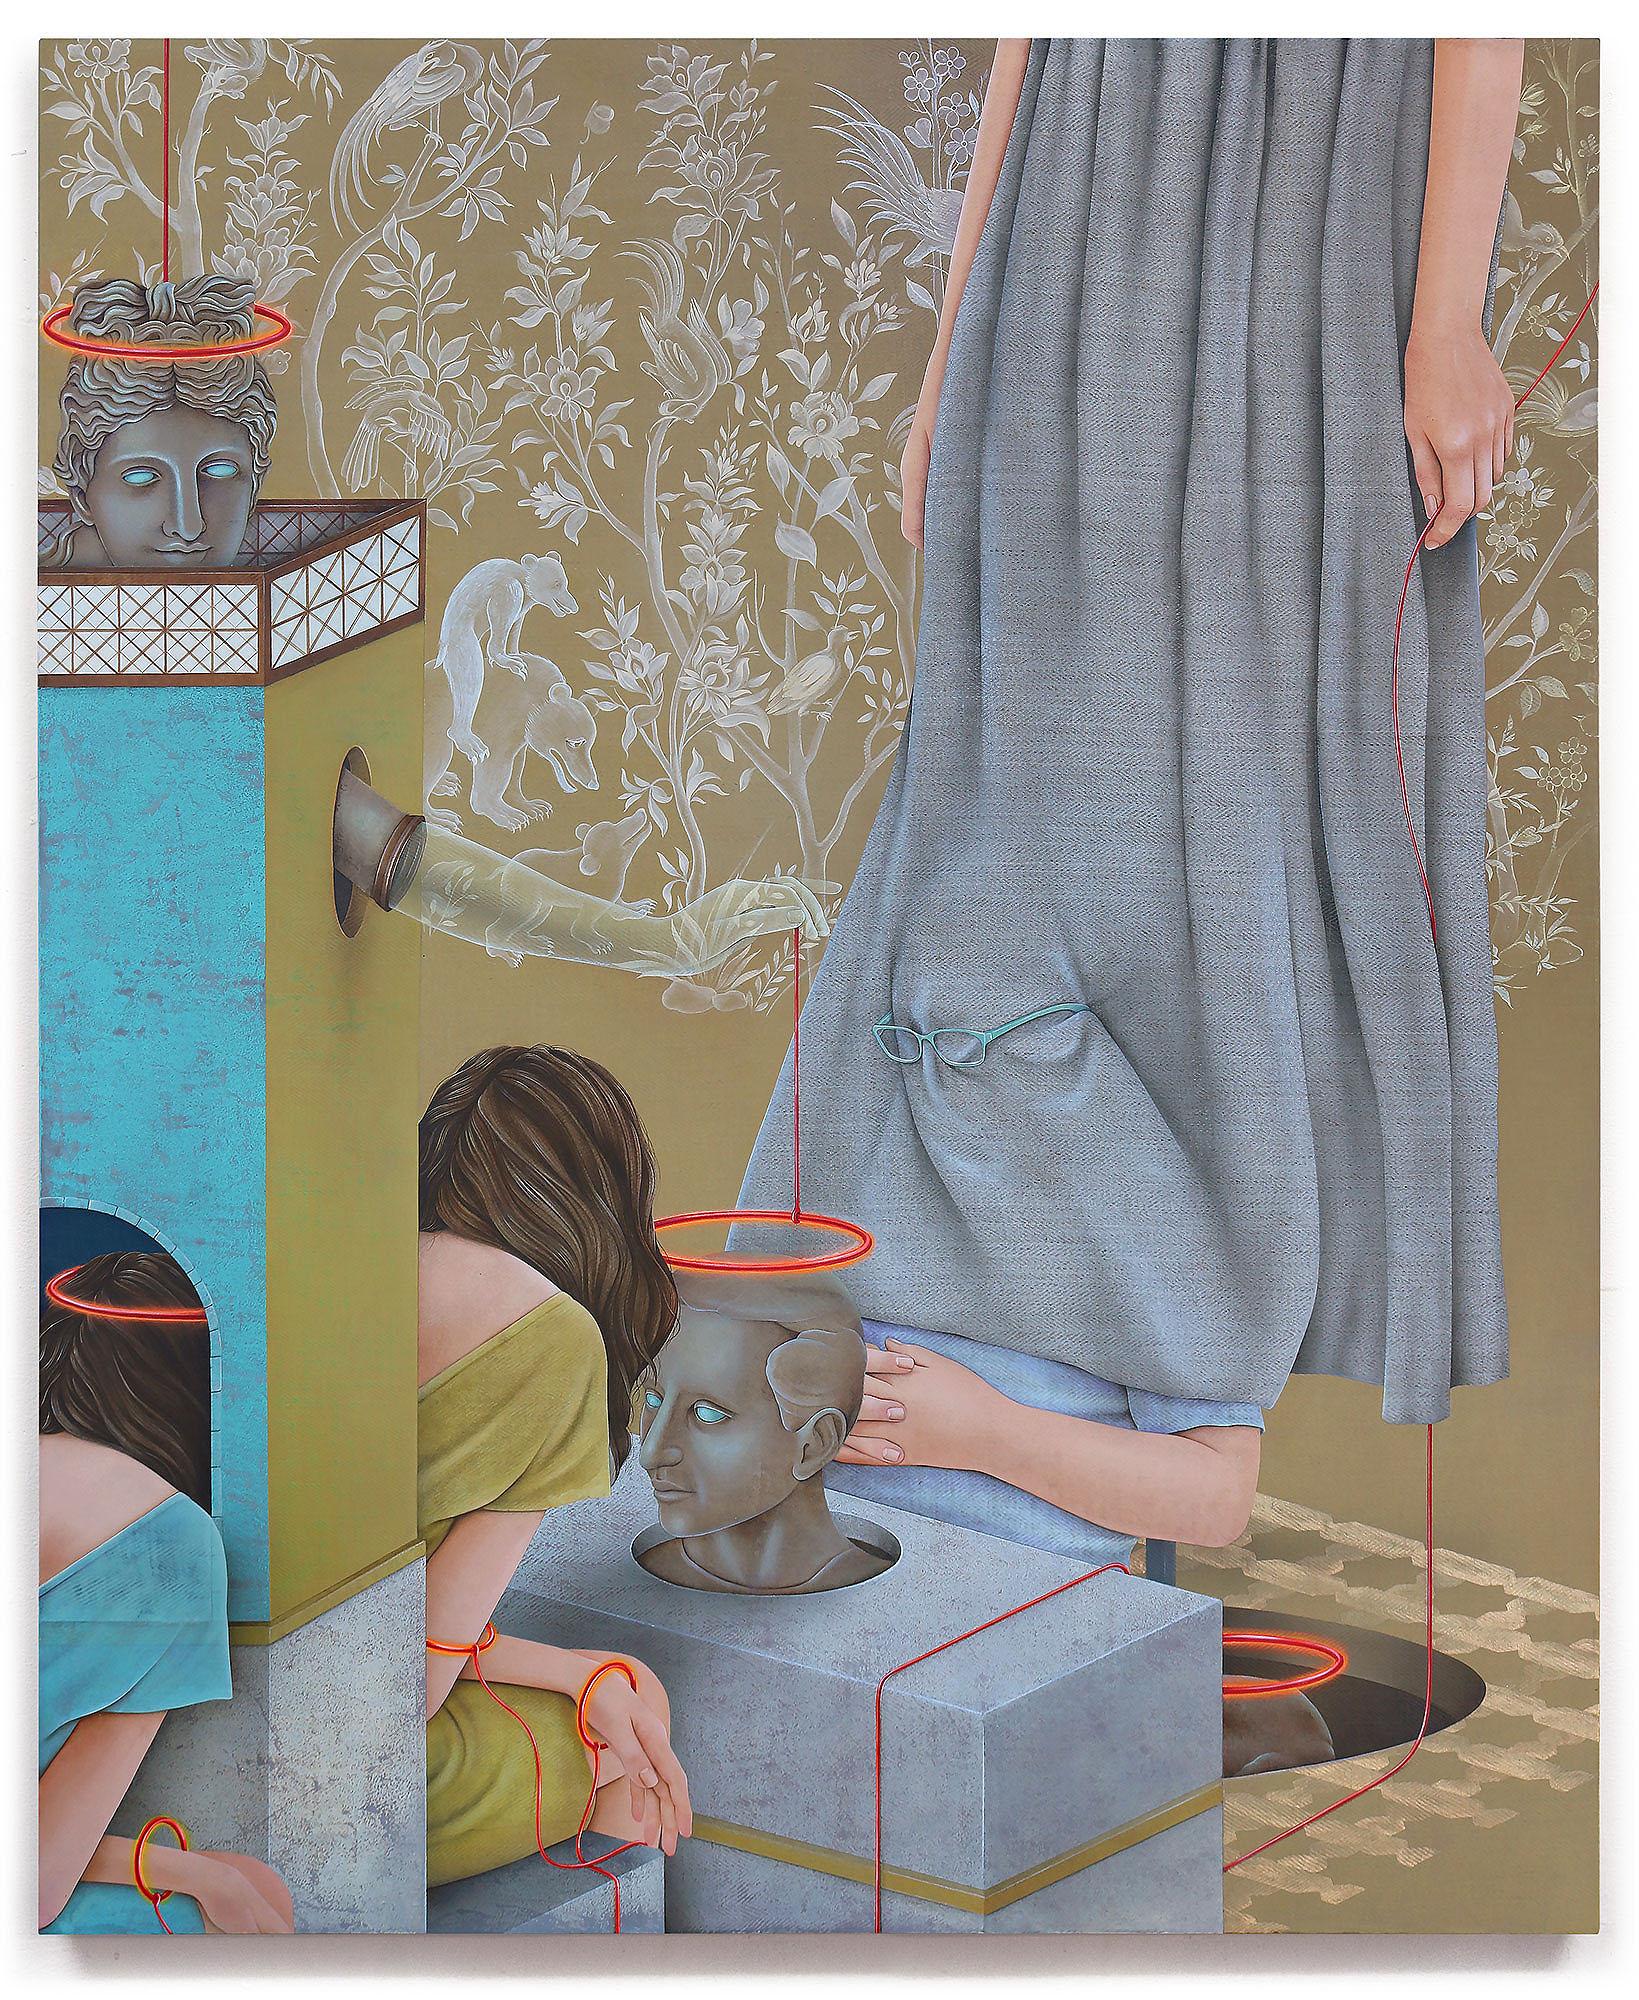 Arghavan Khosravi    Ascension , 2018  Acrylic on herringbone linen canvas mounted on wood panel  39.5 x 32.5  inches